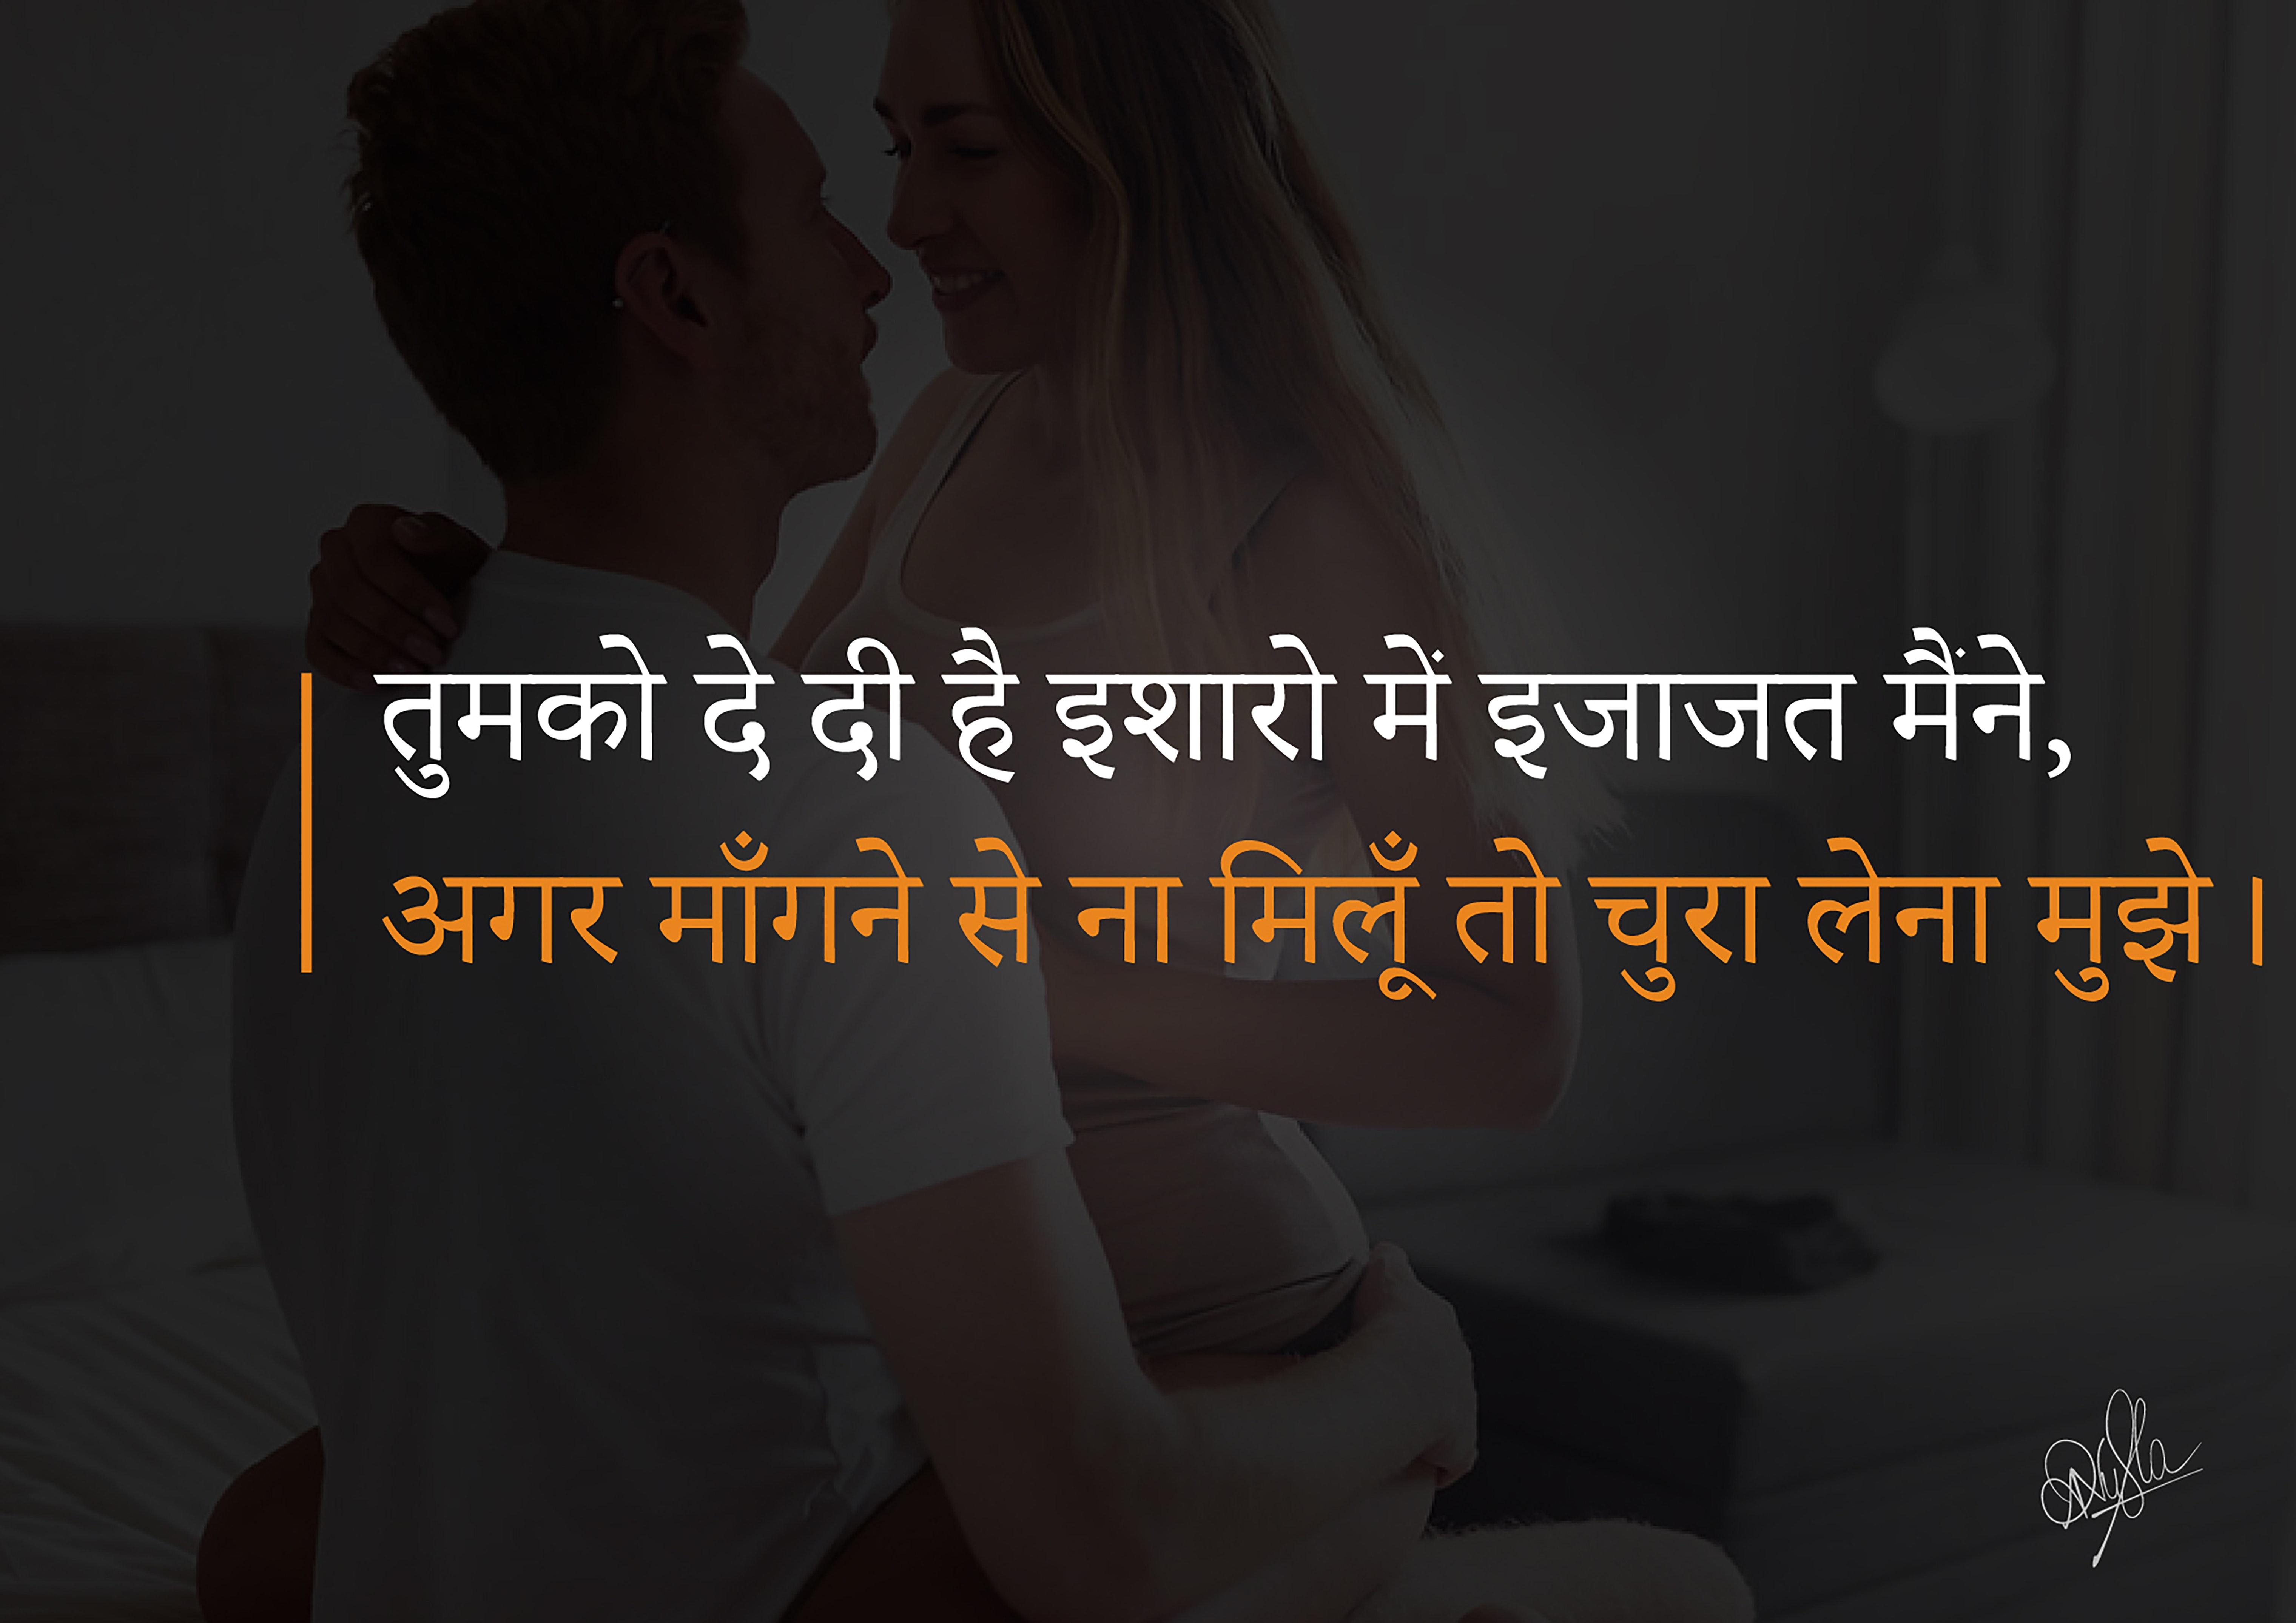 Delhi dating tjenester